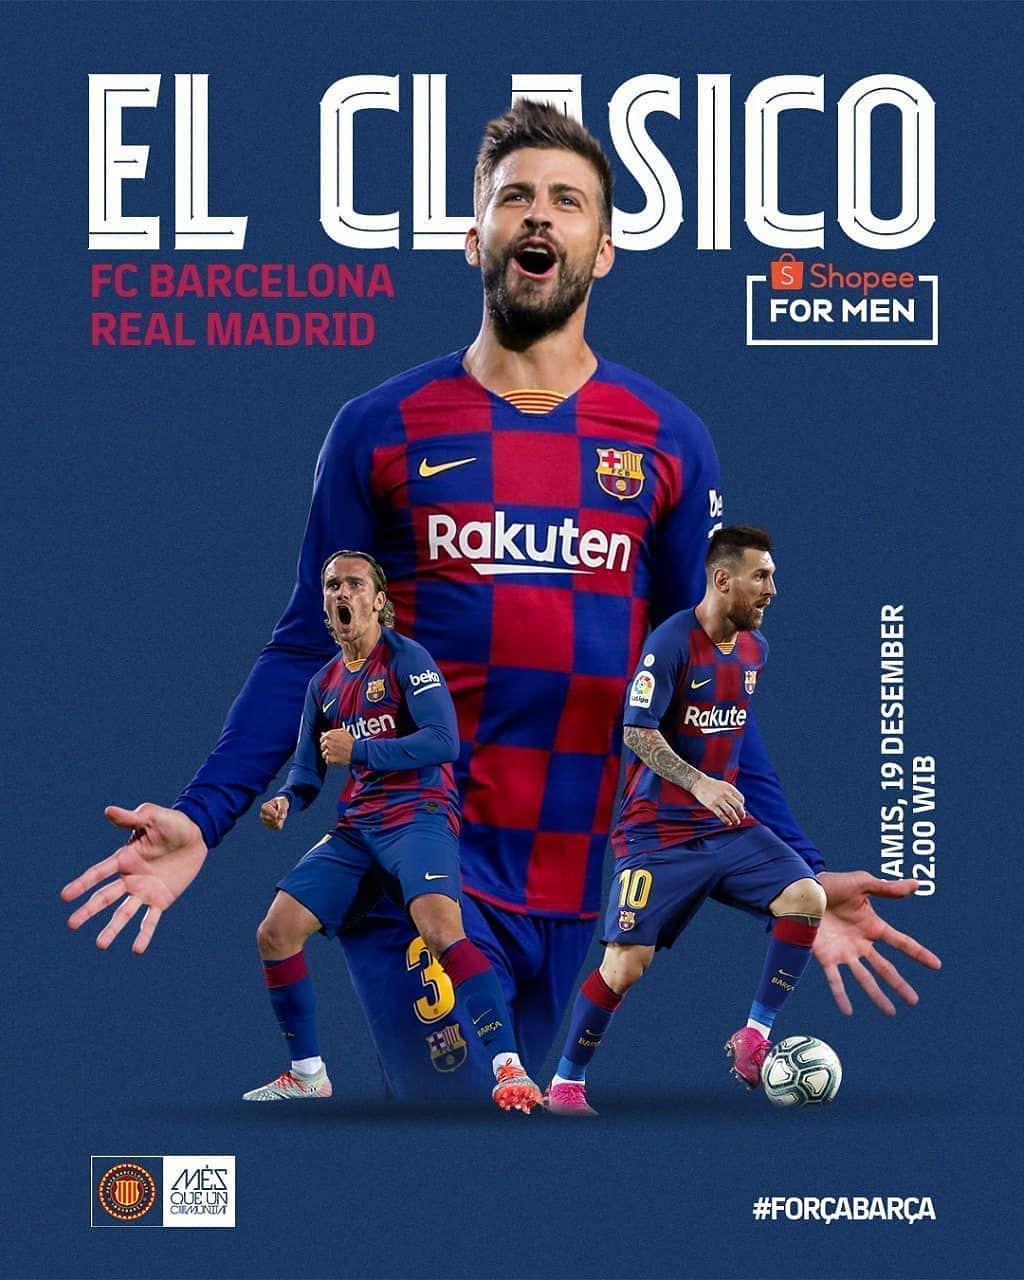 Match Day! It's El Clasico Day! 🔥 . 🏆 La Liga Jornada 10